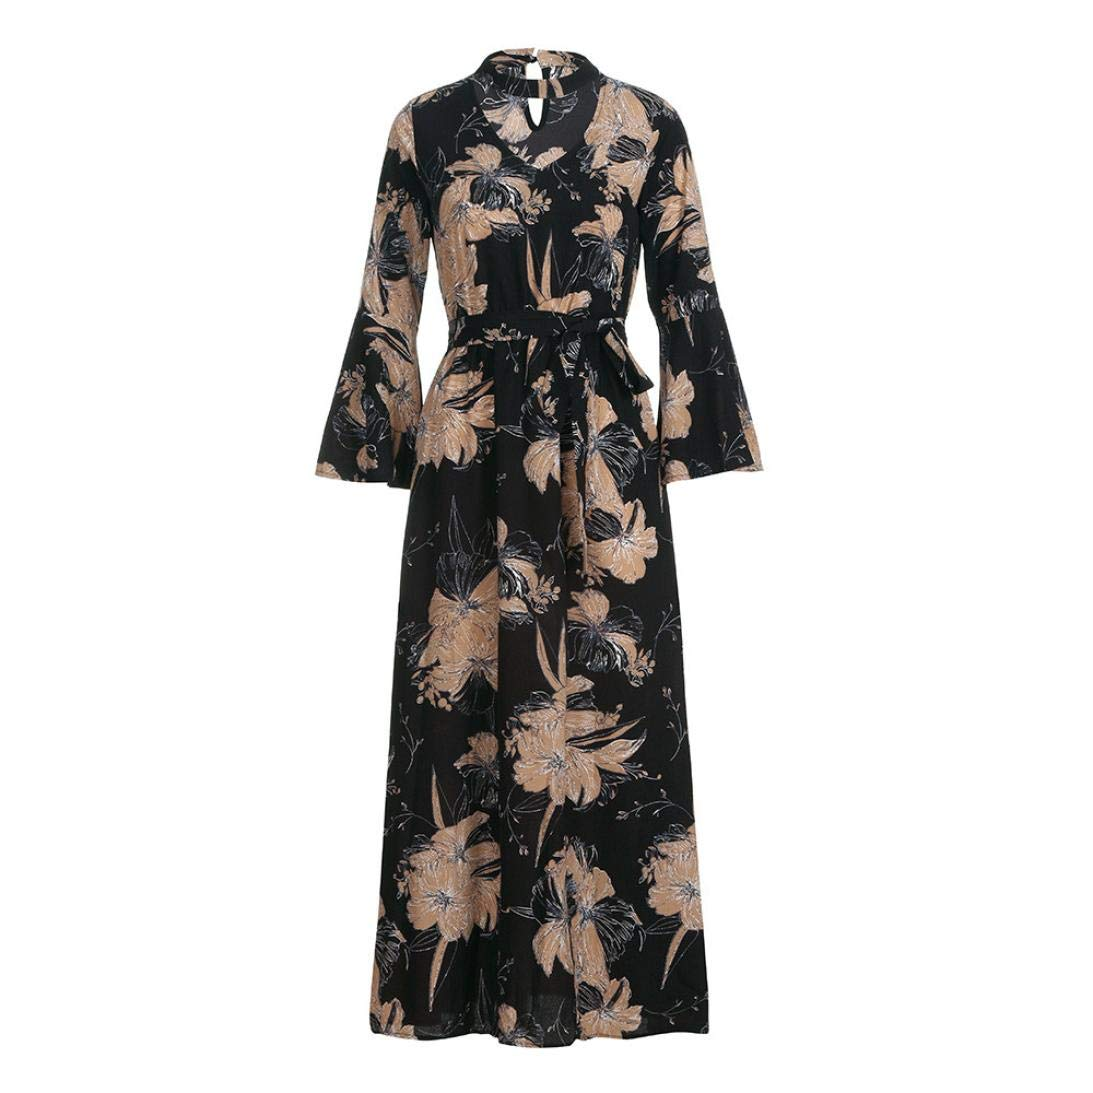 Leoy88 Womens Trumpet Sleeve Print Waist Elastic Waist Polar Long Dress